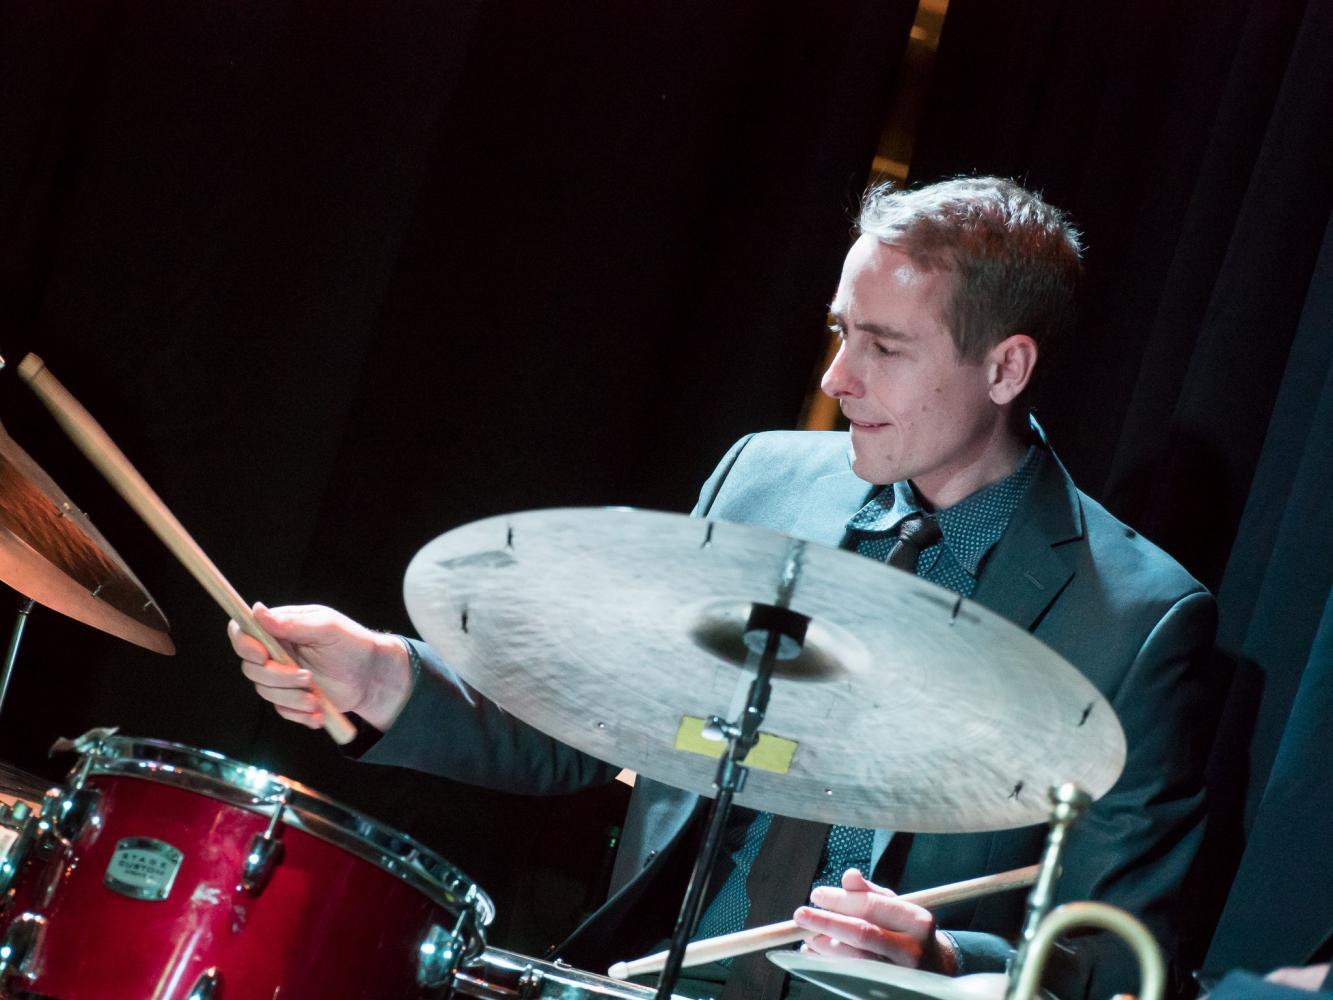 Joe Poole drums